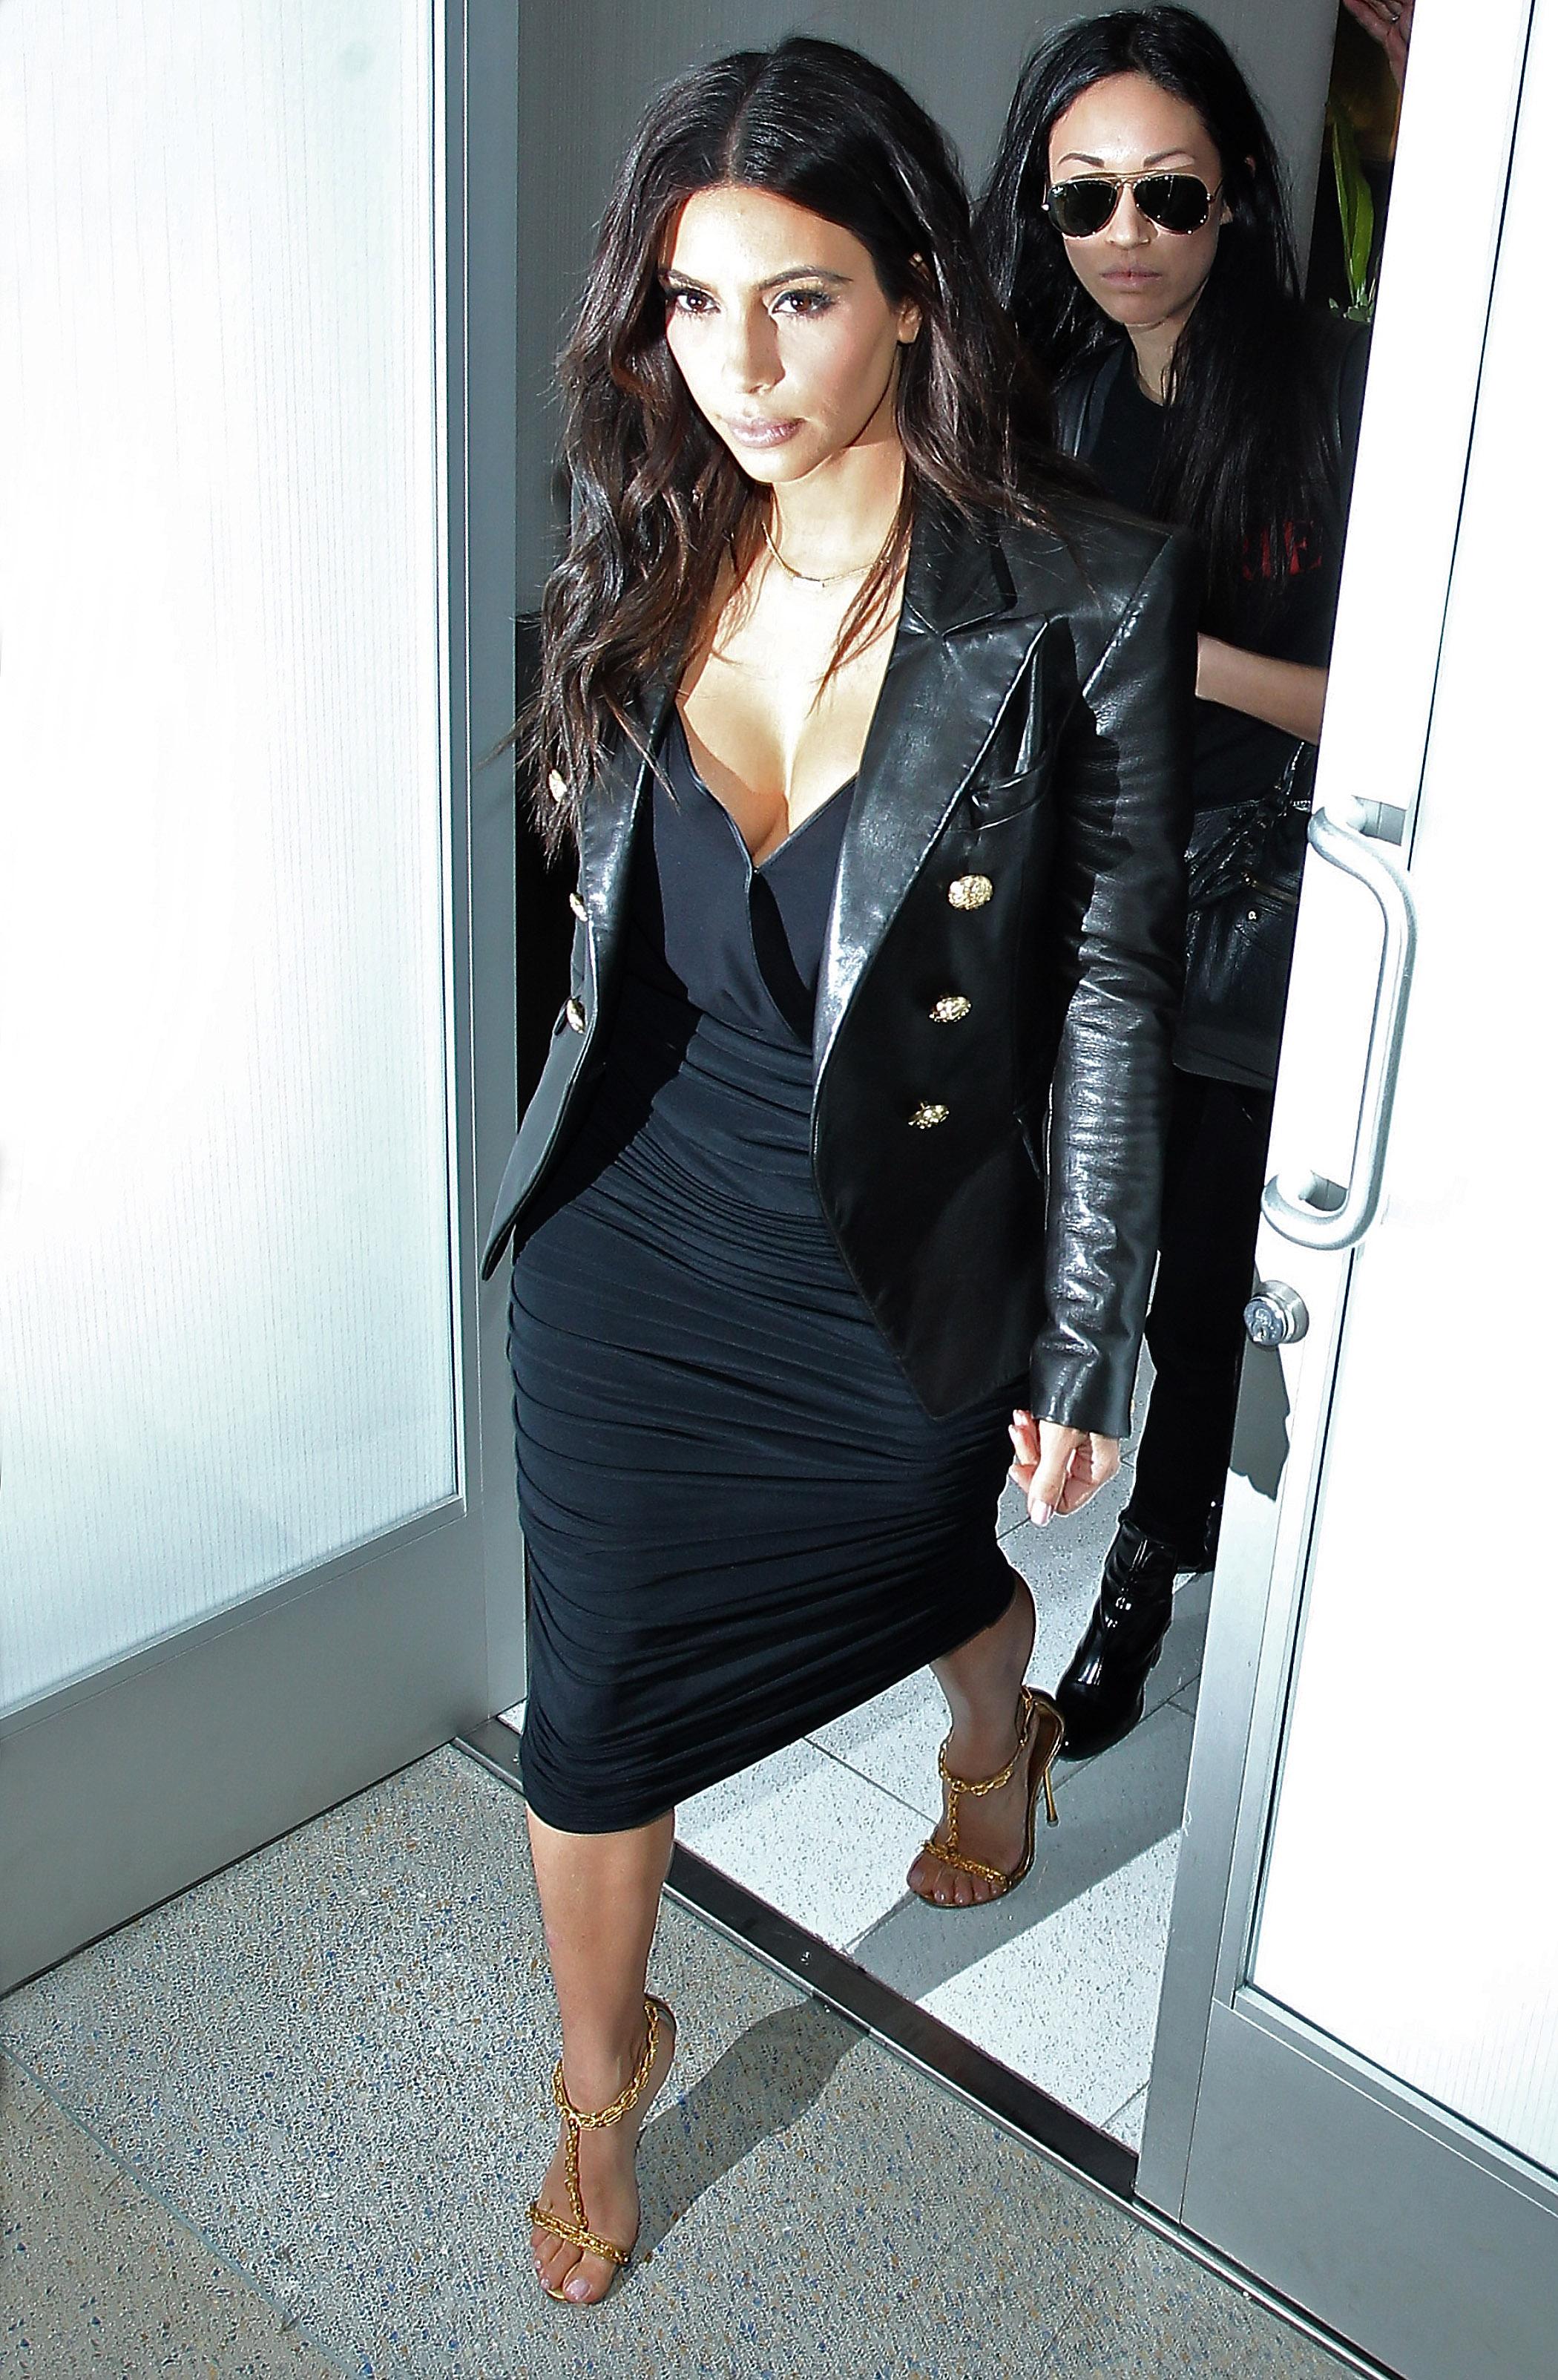 Kim Kardashian, Kourtney Kardashian and Khloe Kardashian leave on a flight from Los Angeles International Airport